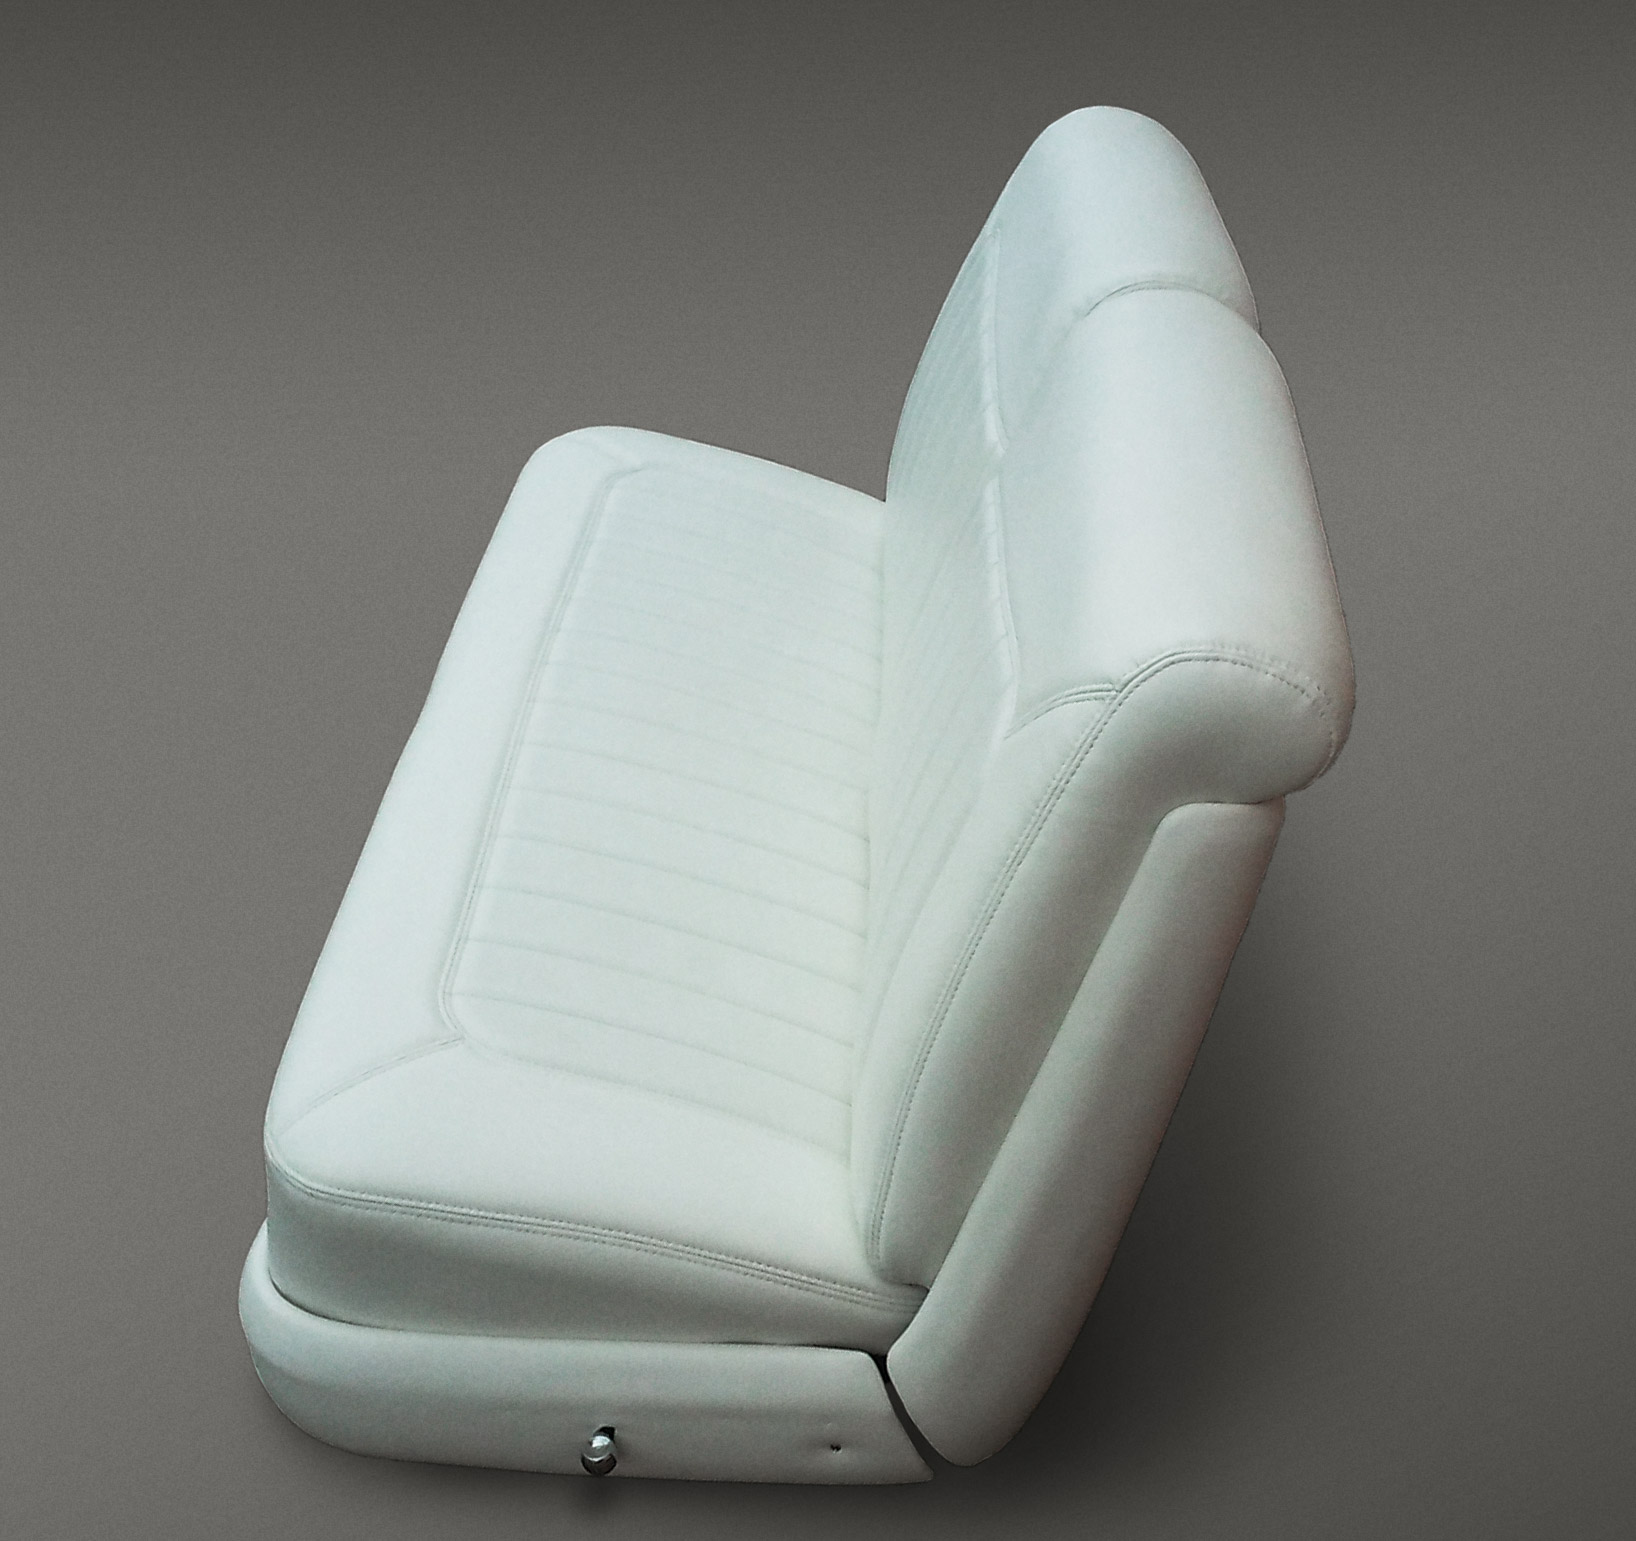 dave-seats-pics-244.jpg